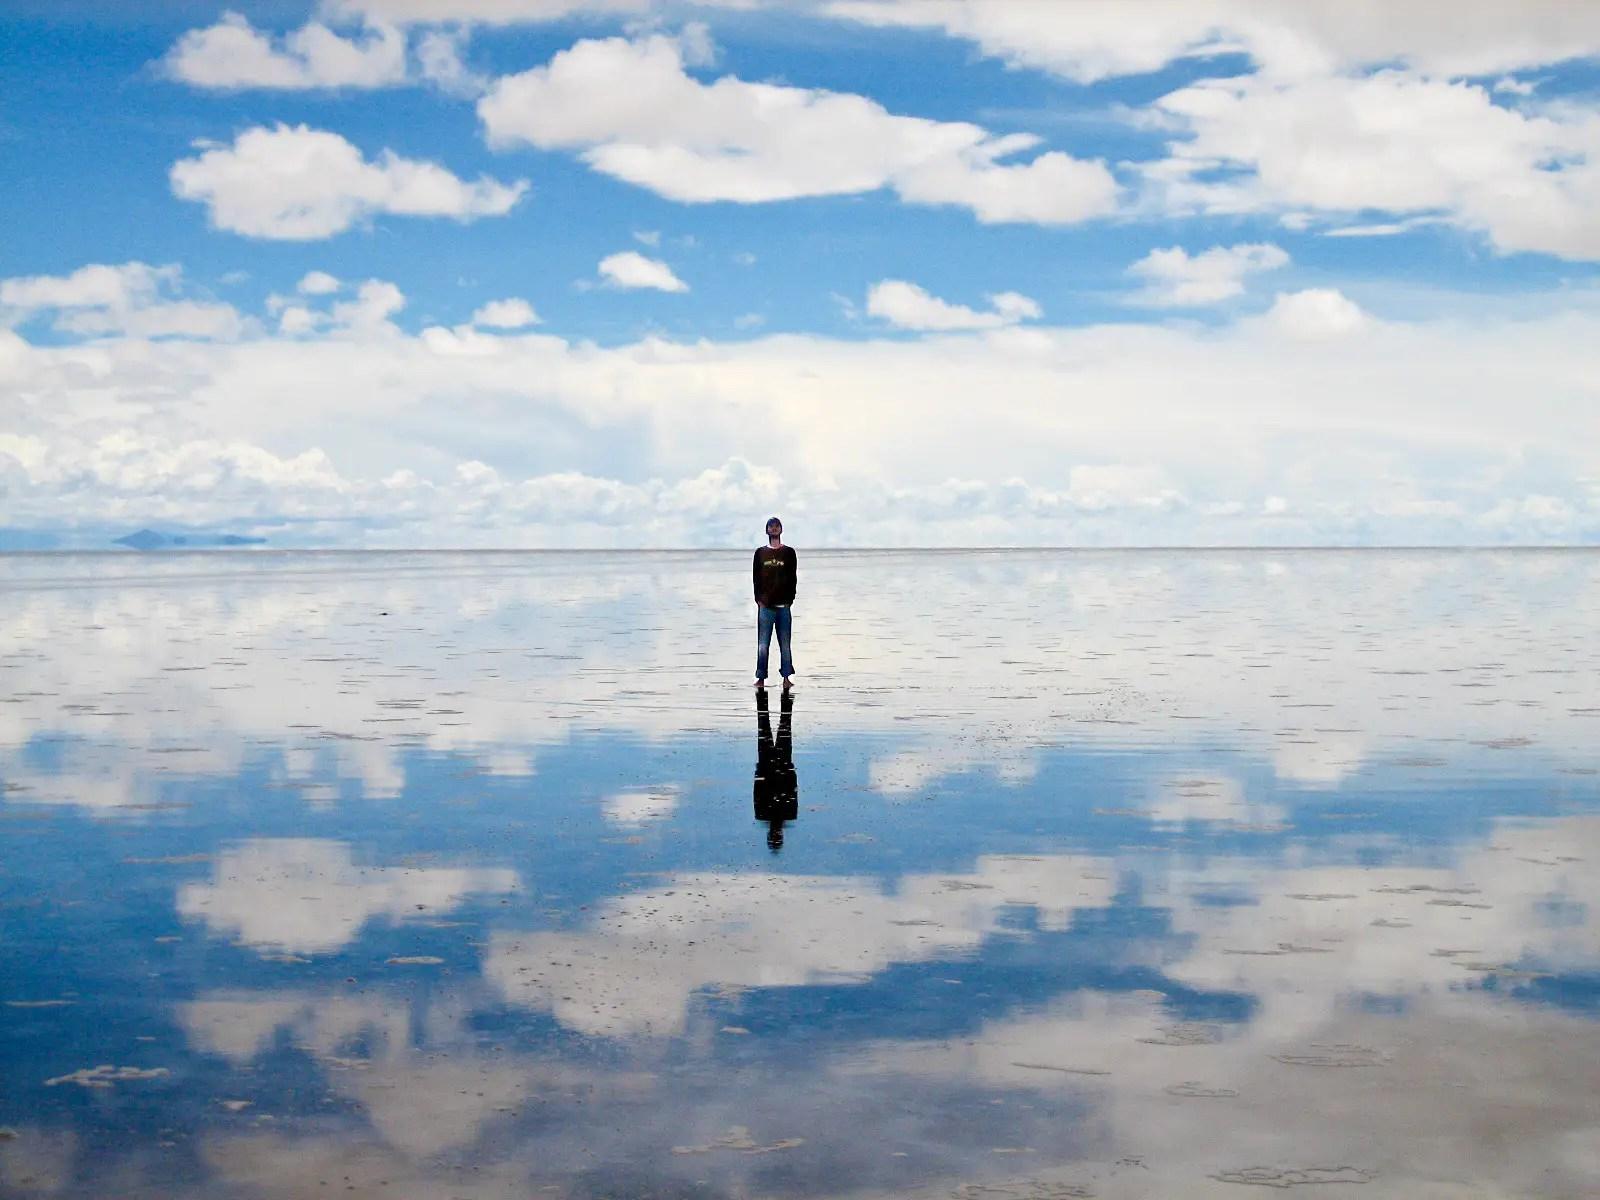 Trek to the Salar de Uyuni, the massive salt flat in Bolivia.